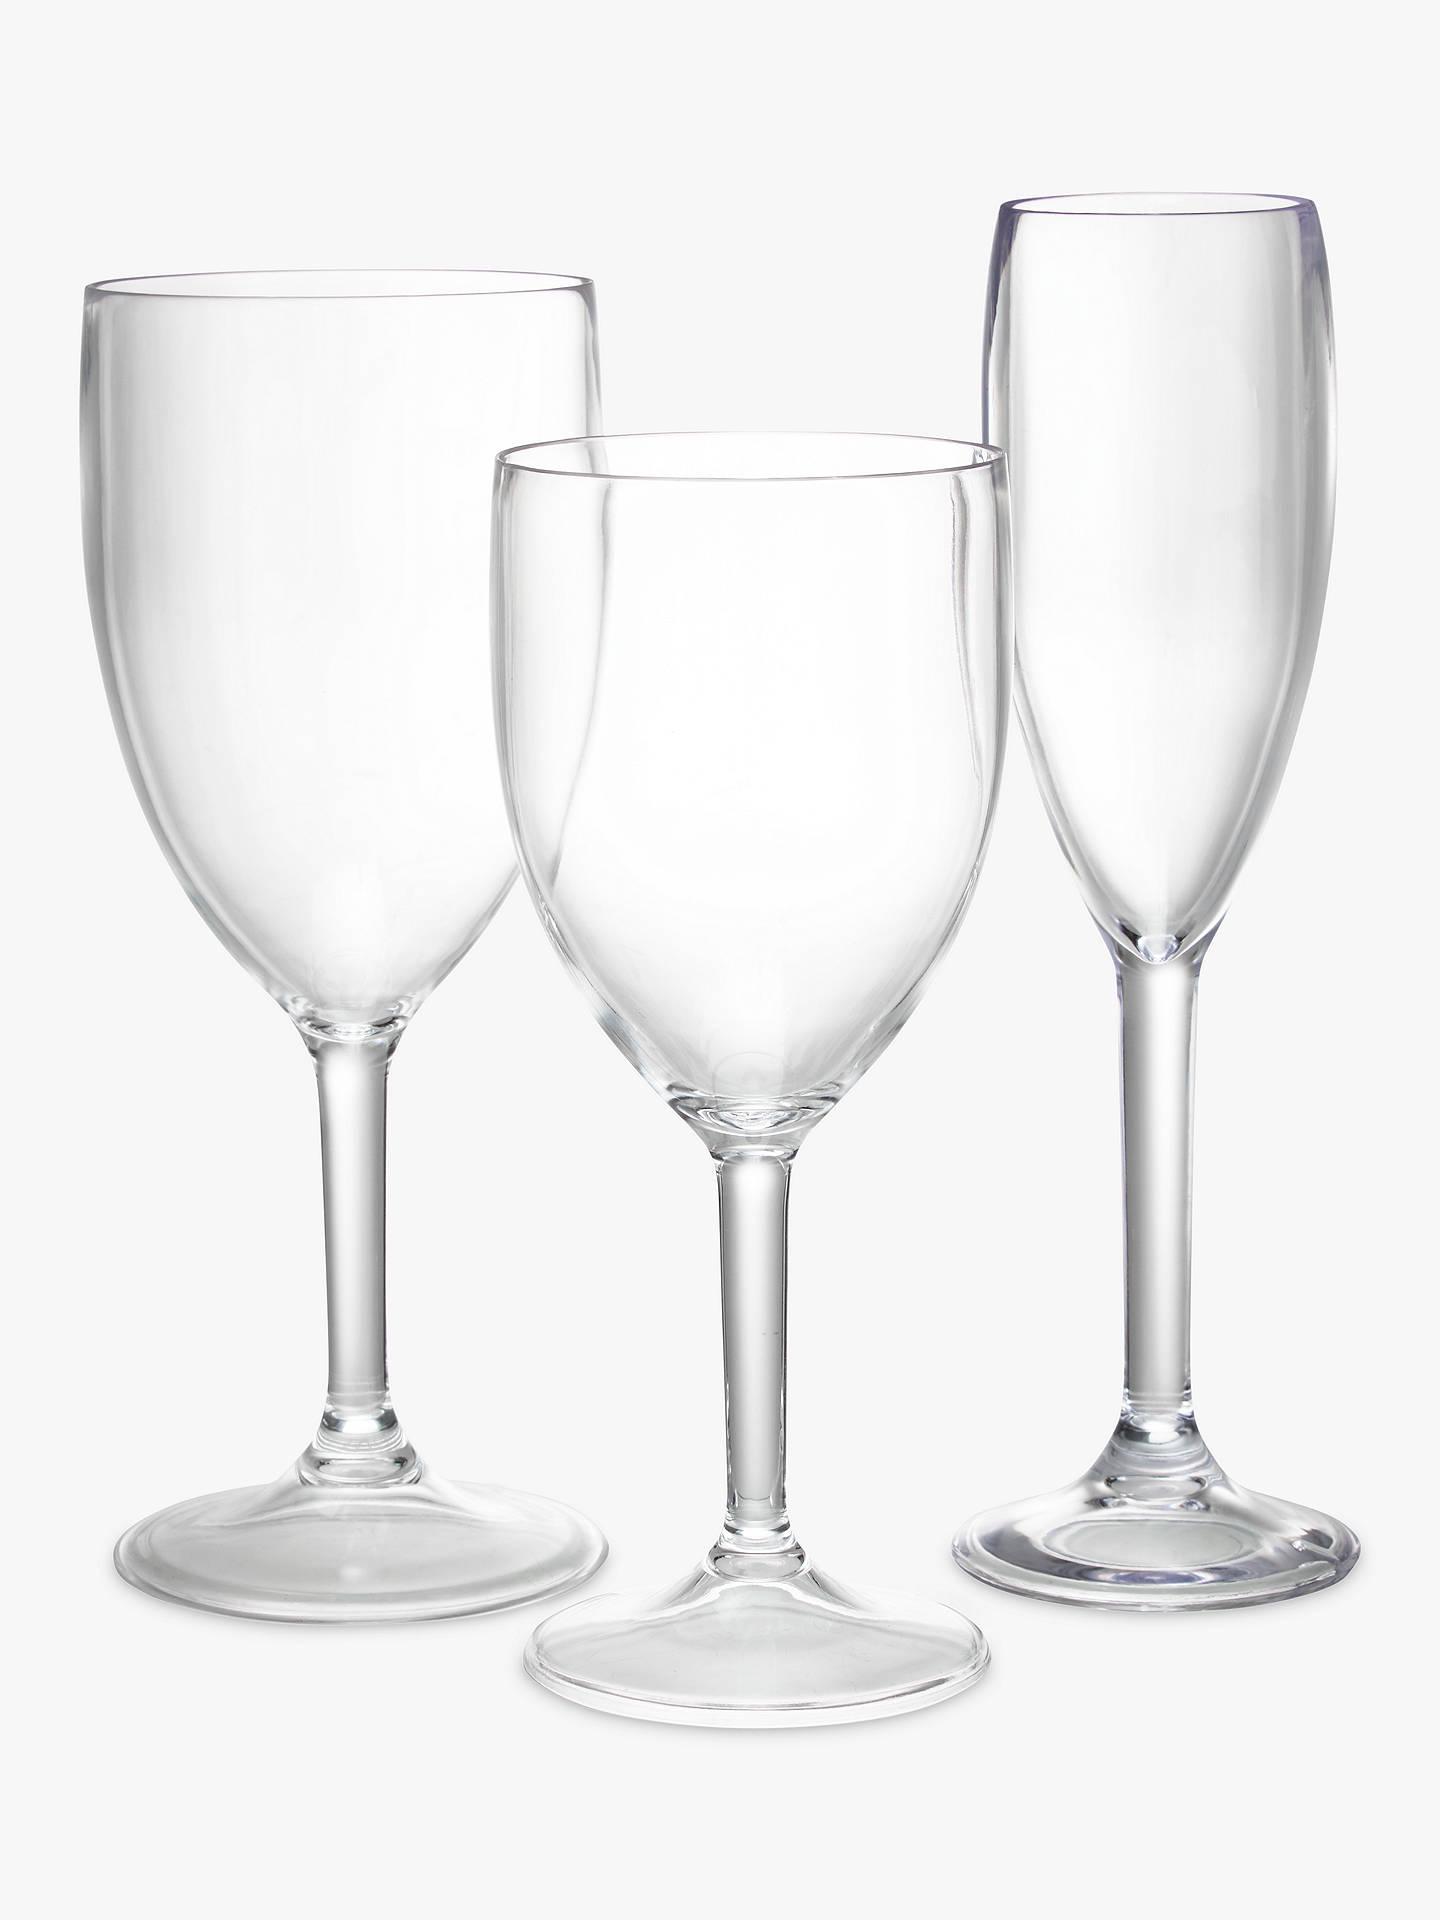 john lewis partners plastic wine glasses set of 4. Black Bedroom Furniture Sets. Home Design Ideas